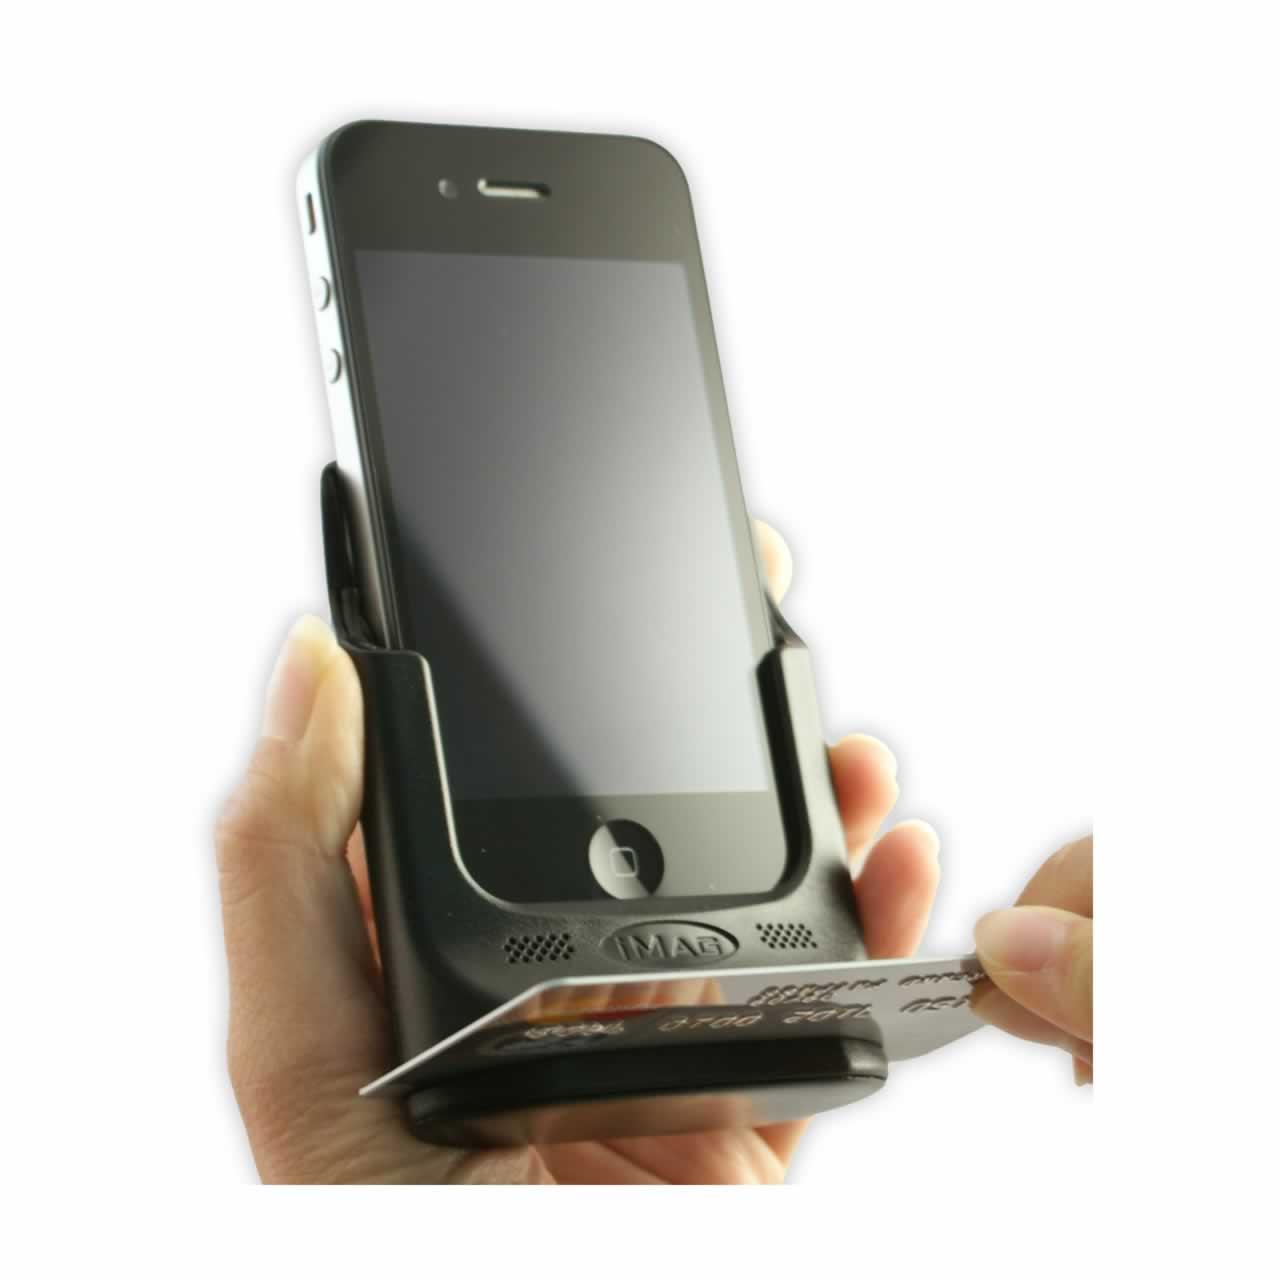 ID-Tech iMag Credit Card Reader